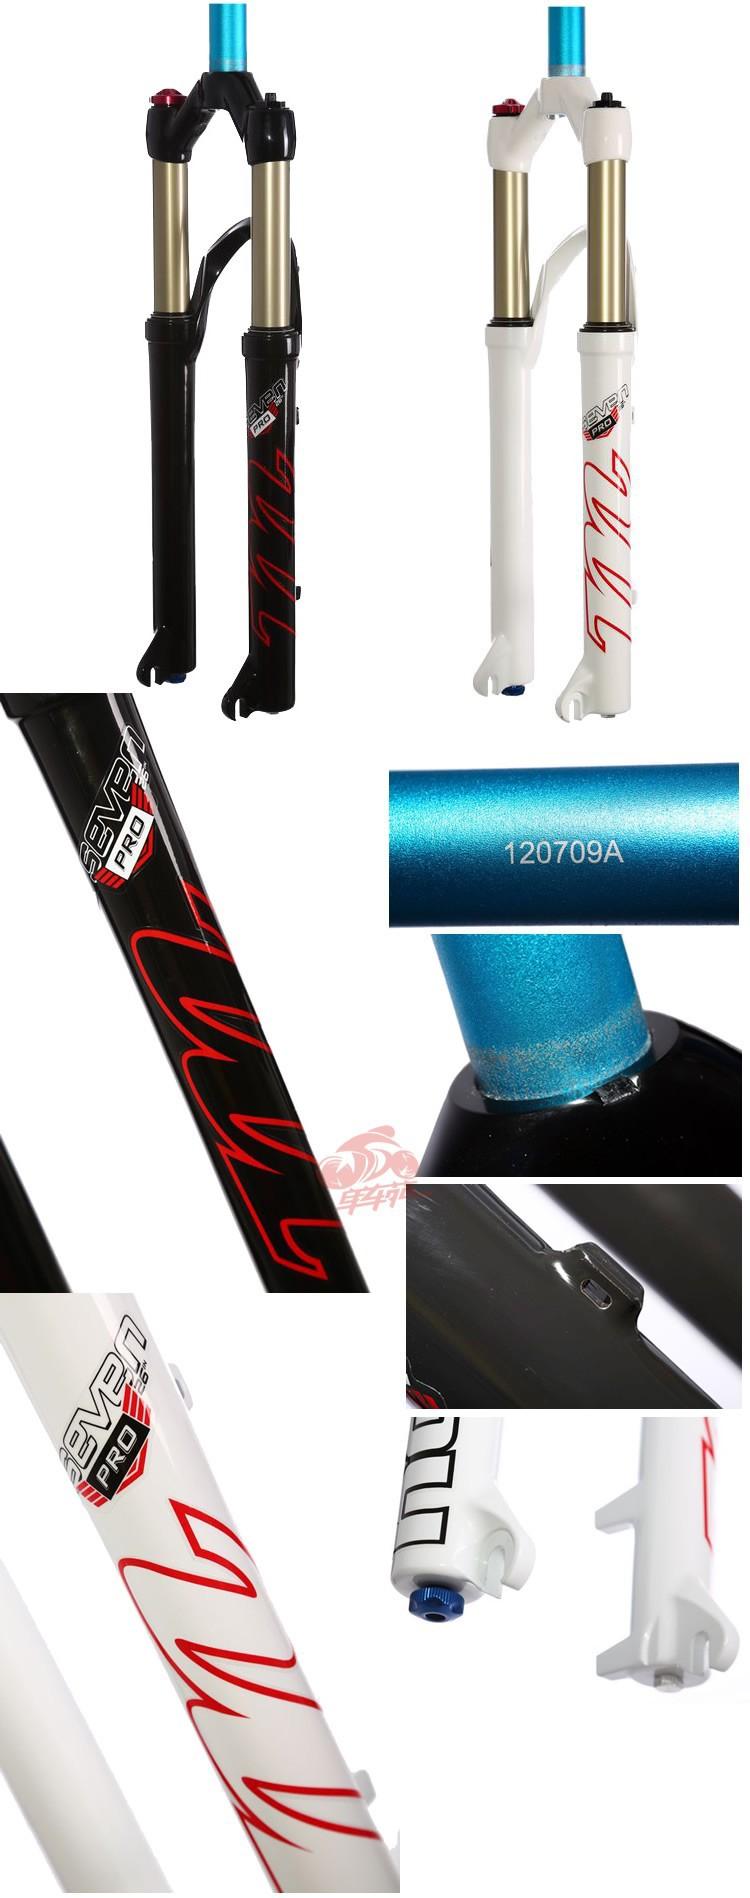 Вилка велосипедная 2015 PRO 26 MTB rock shox